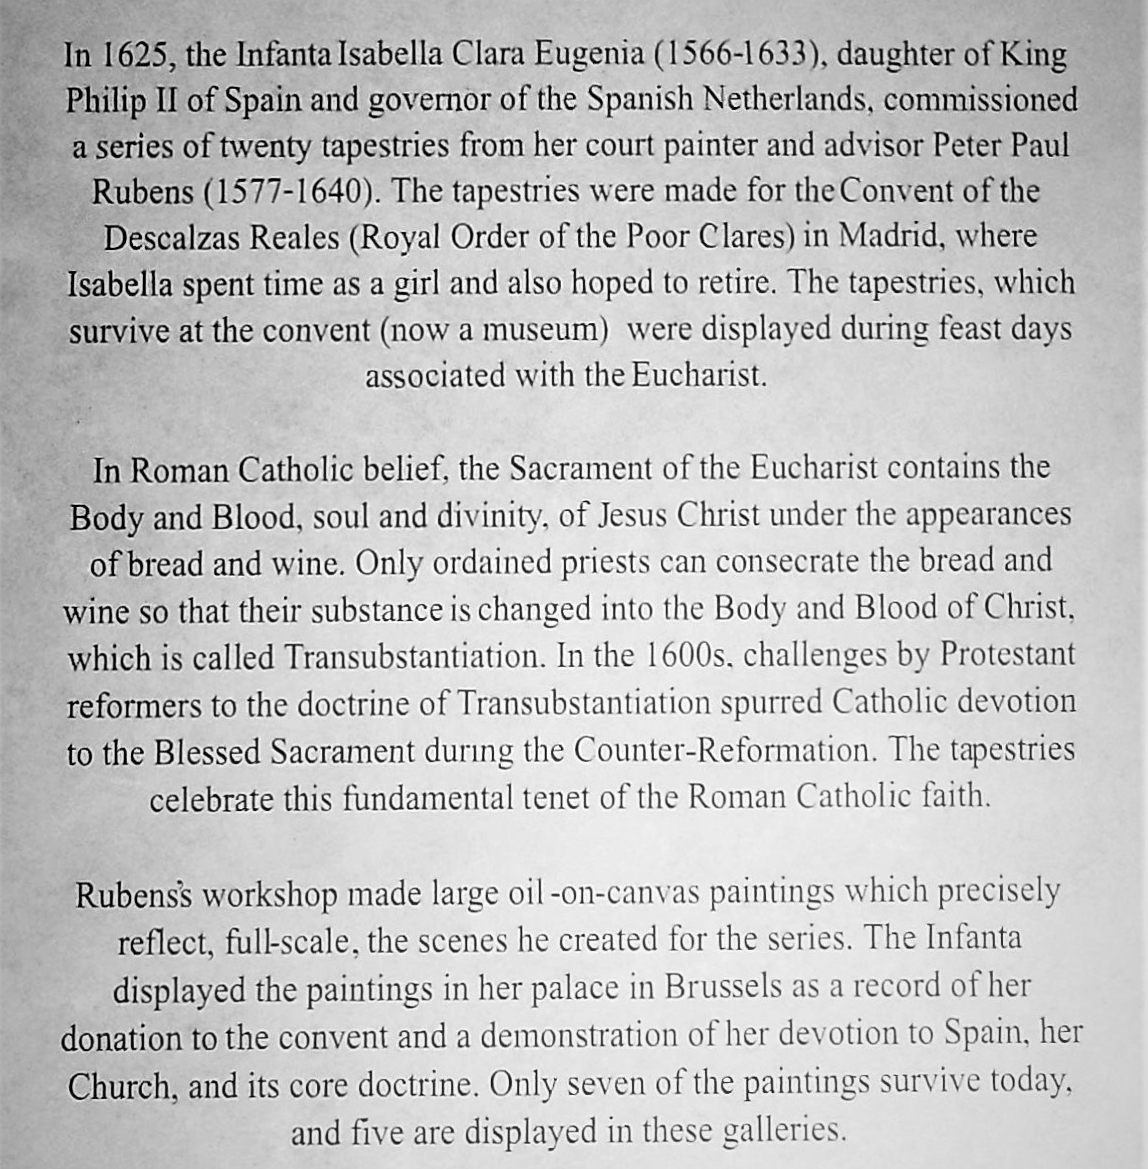 Rubens info